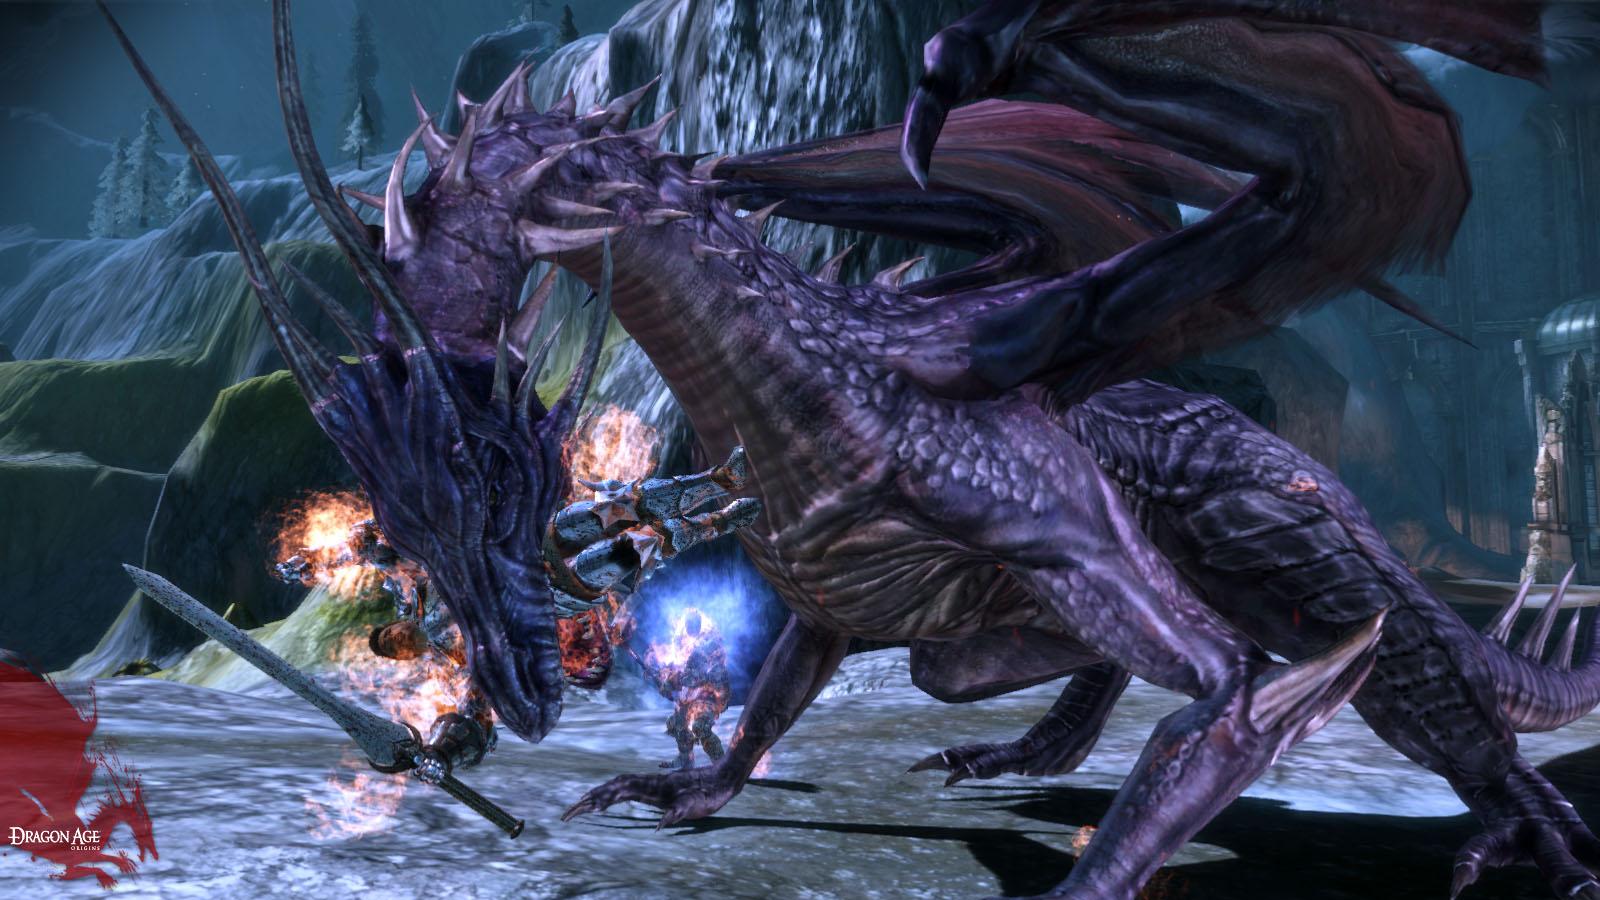 Dragon Age Promo